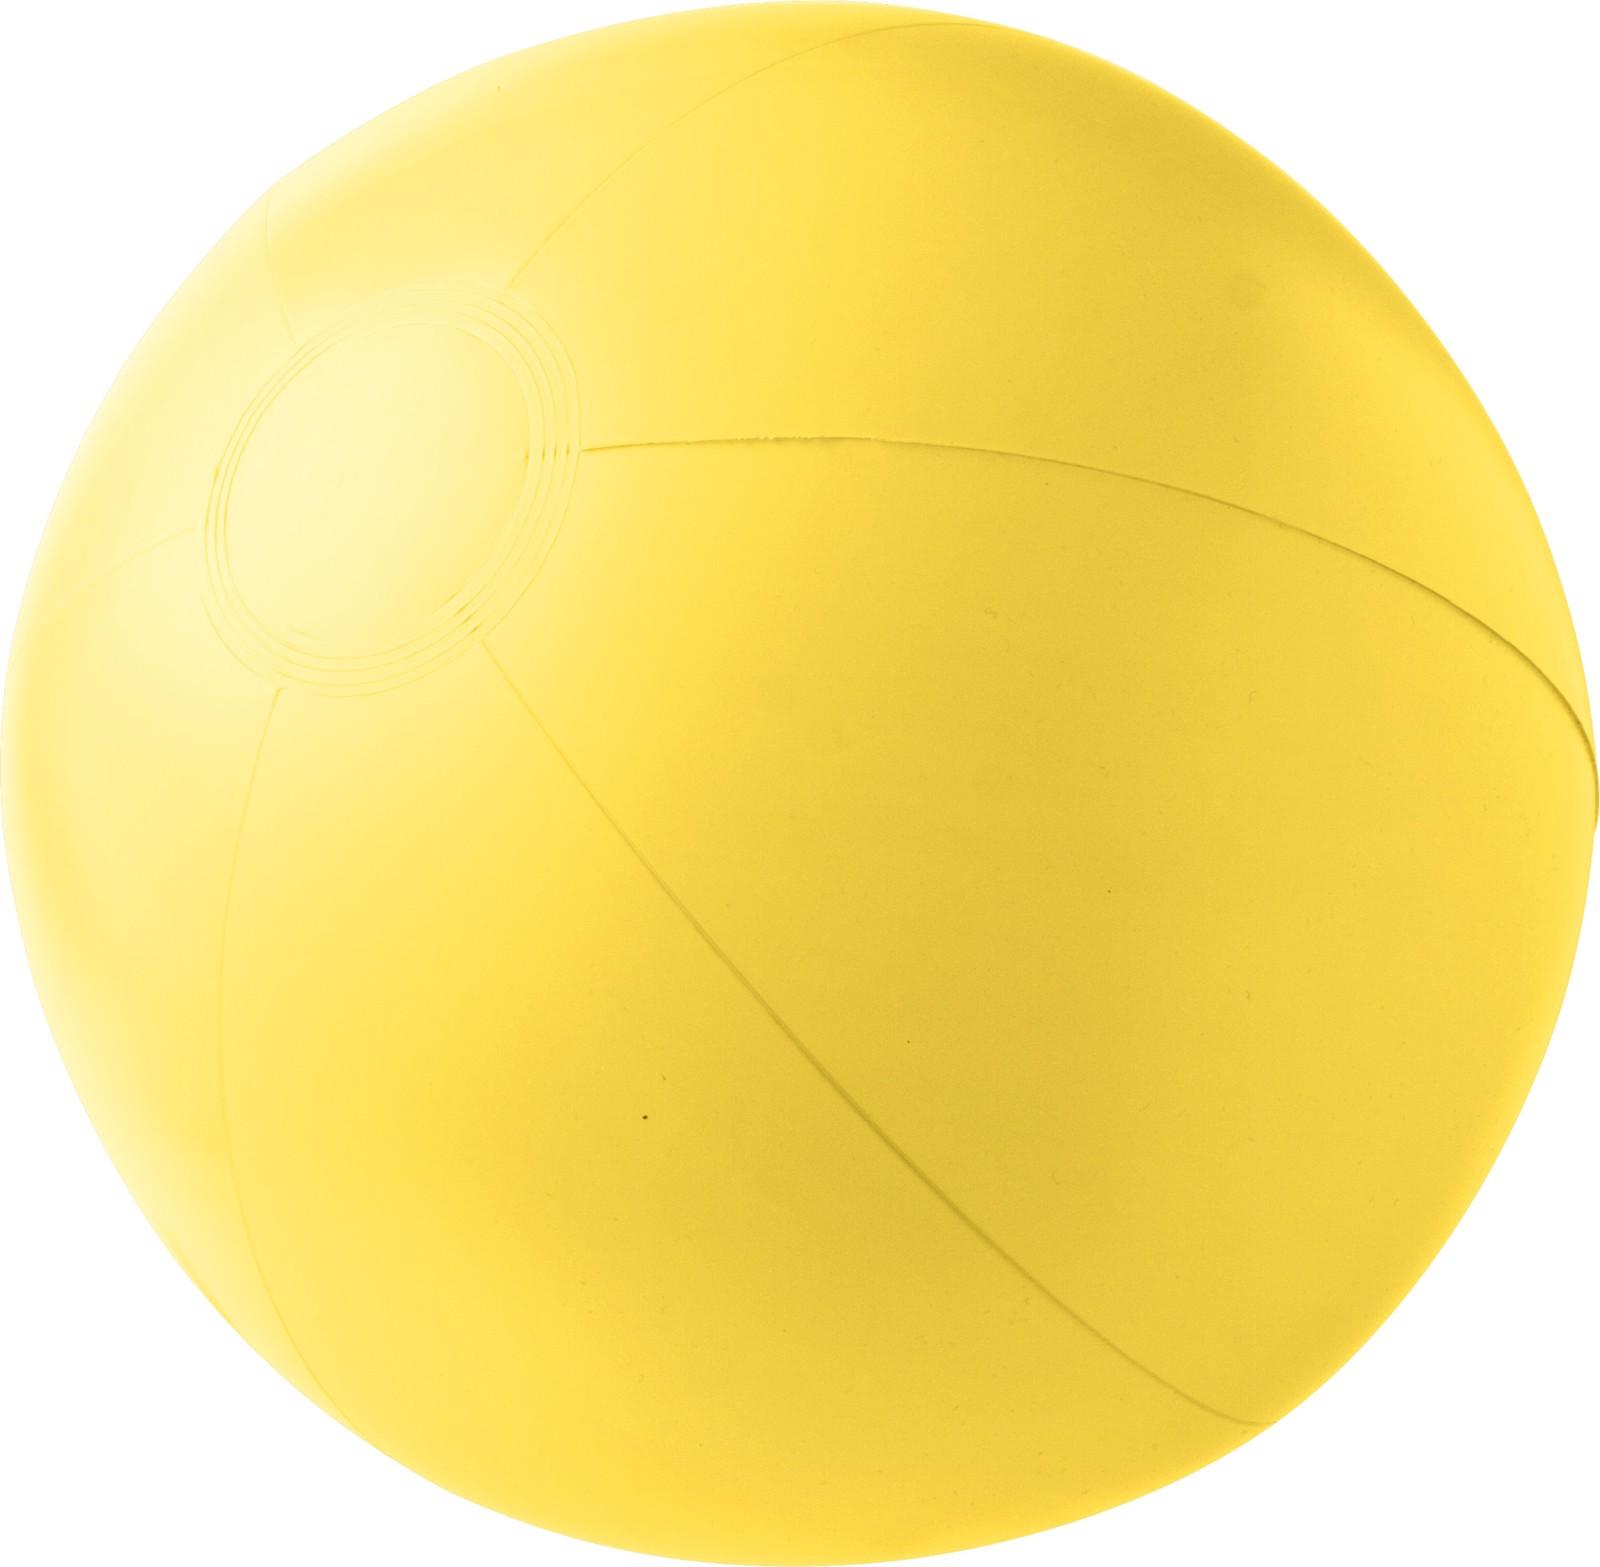 PVC beach ball - Yellow